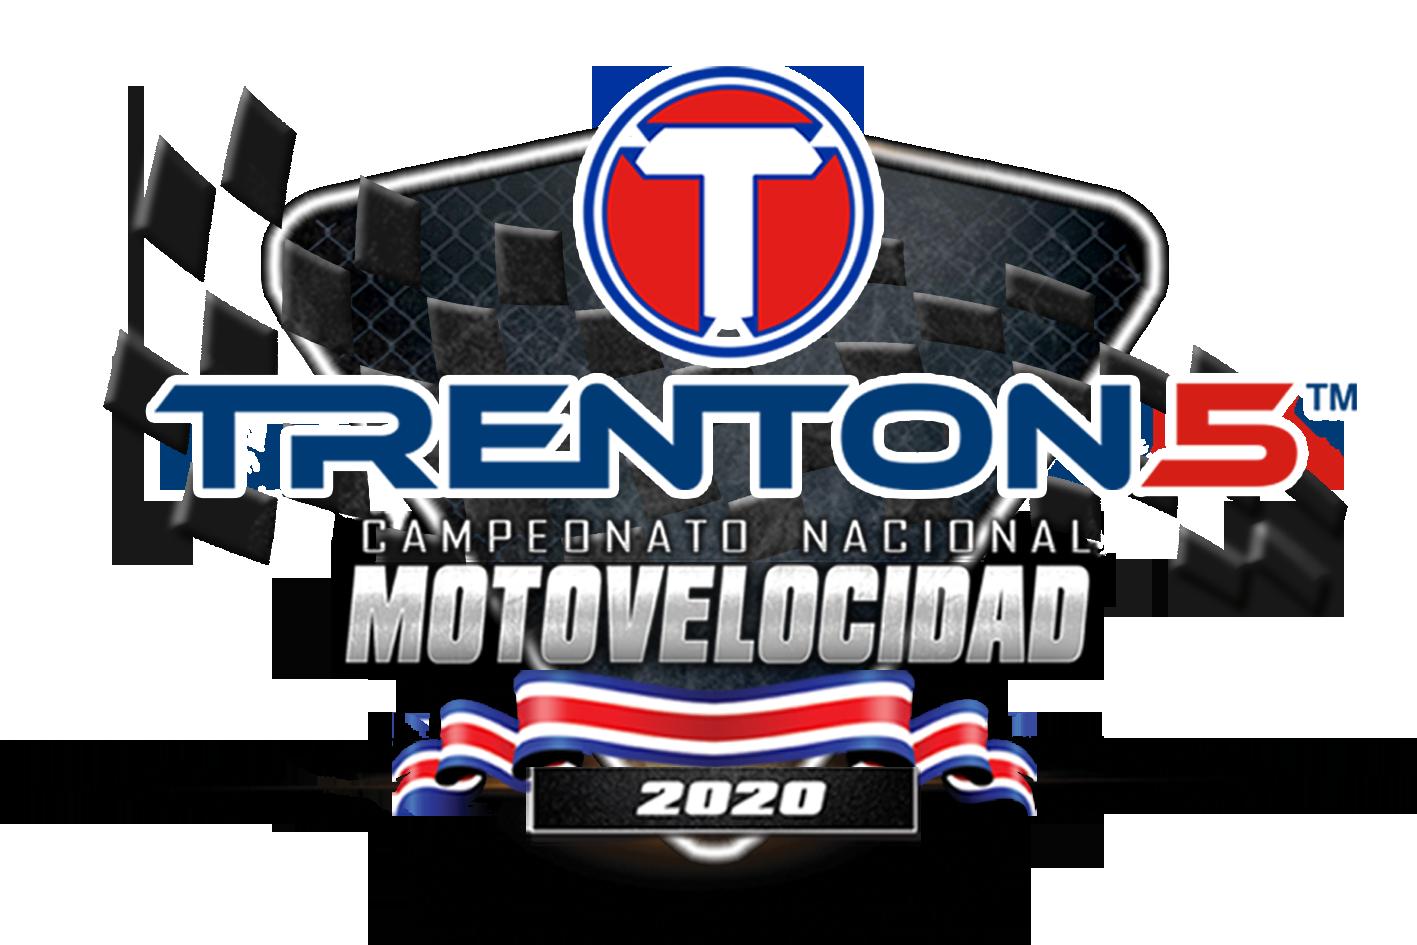 Logo Campeonato Trenton5